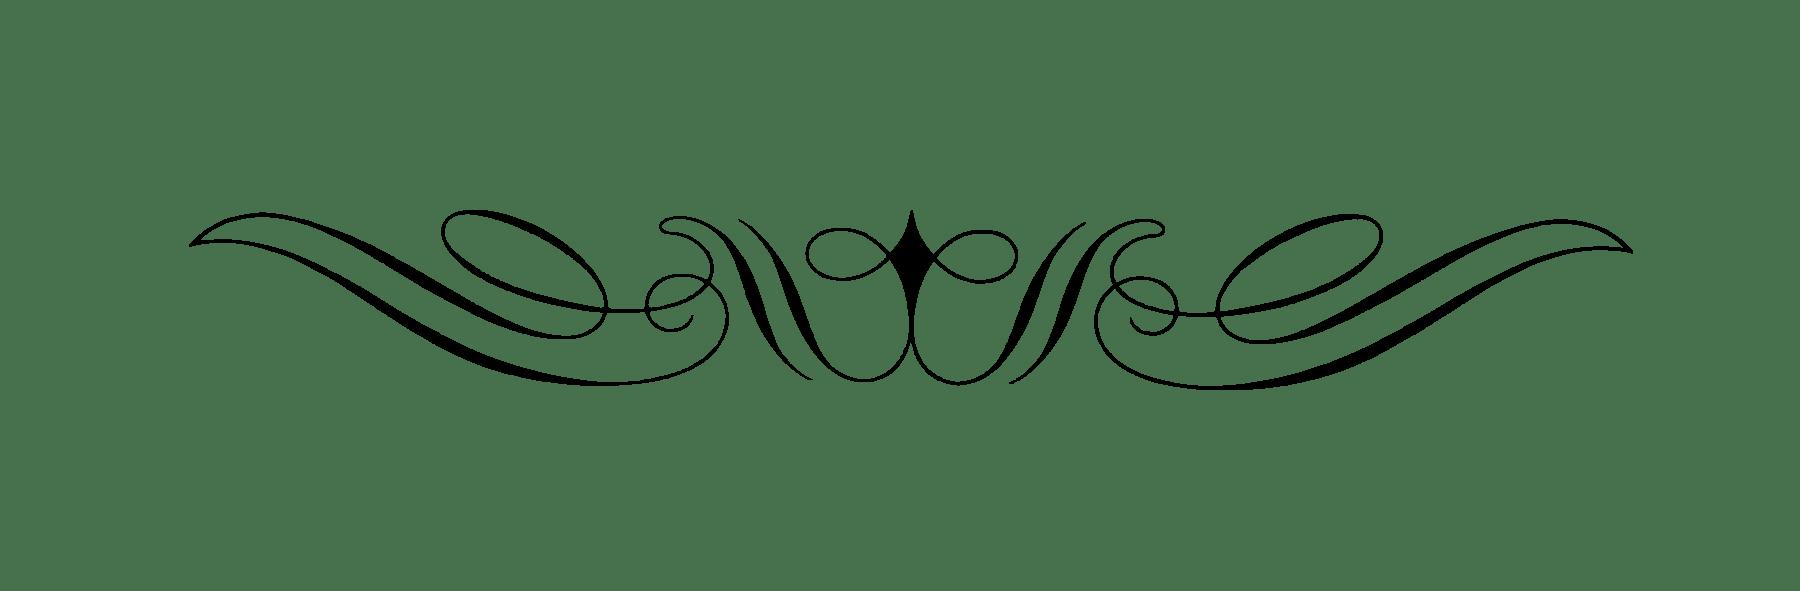 jpg freeuse stock Curly Art Nouveau Divider transparent PNG